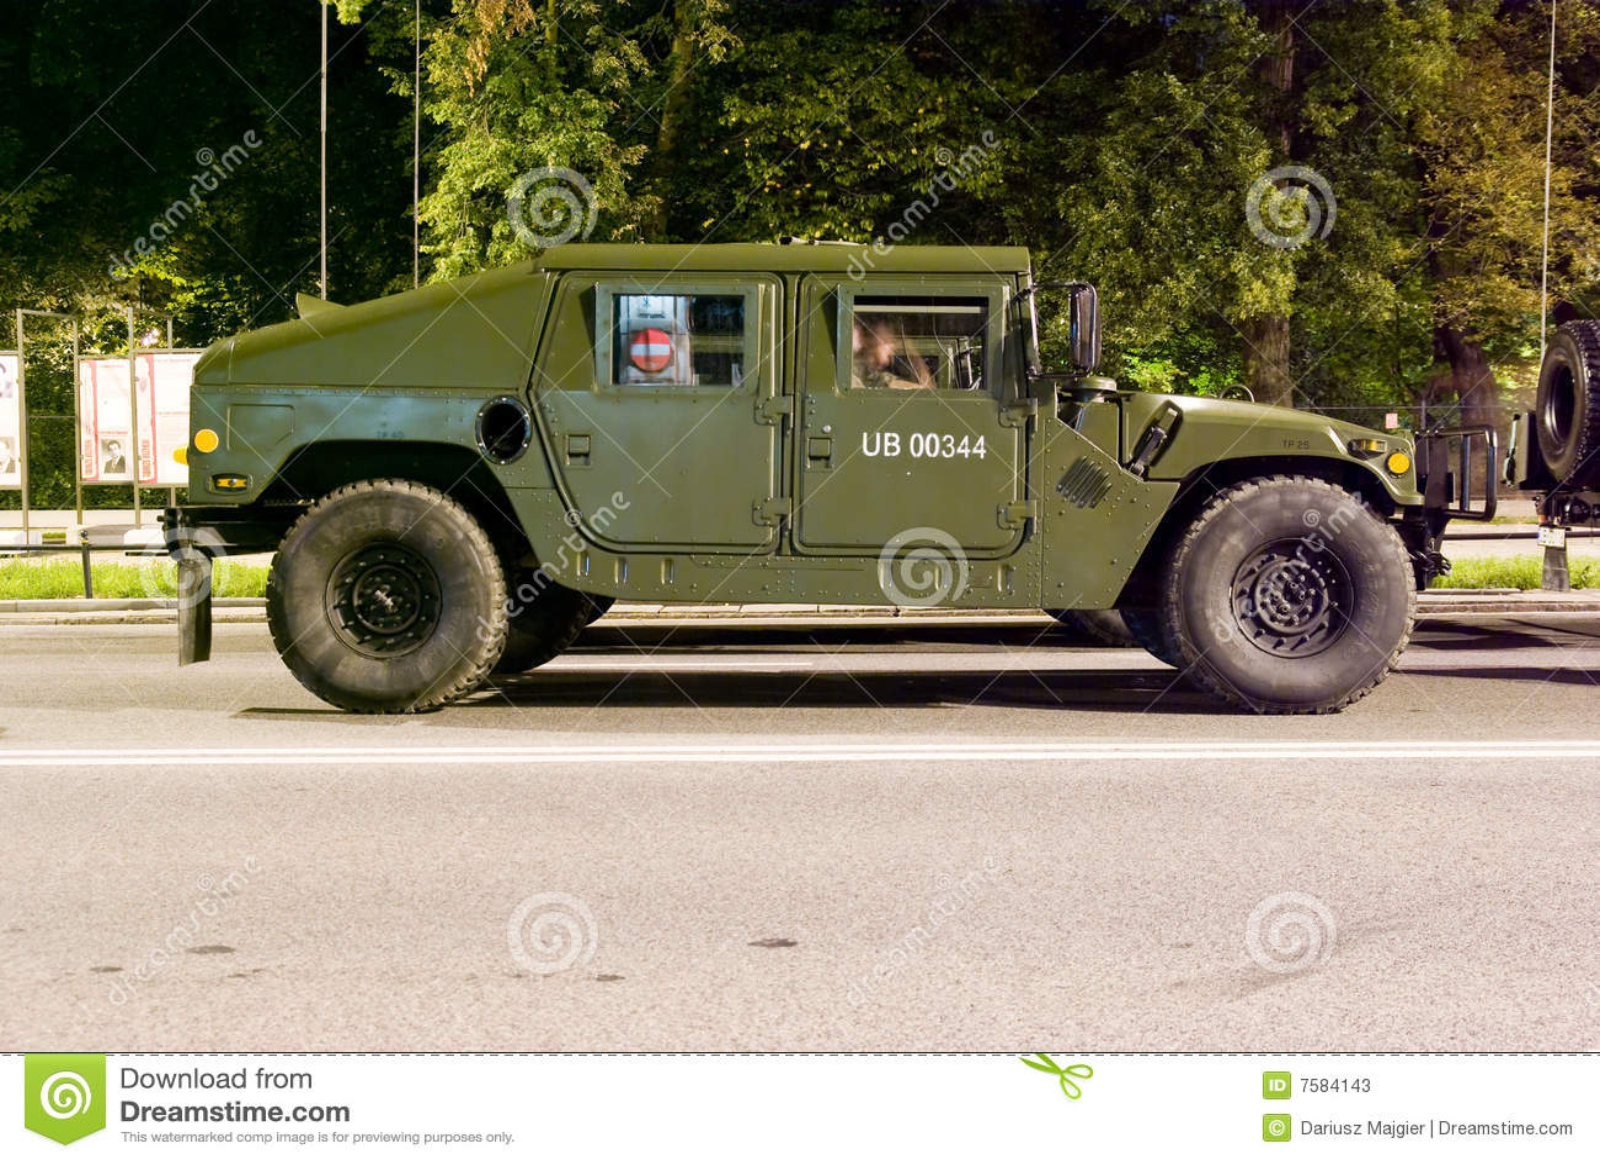 Police Humvee